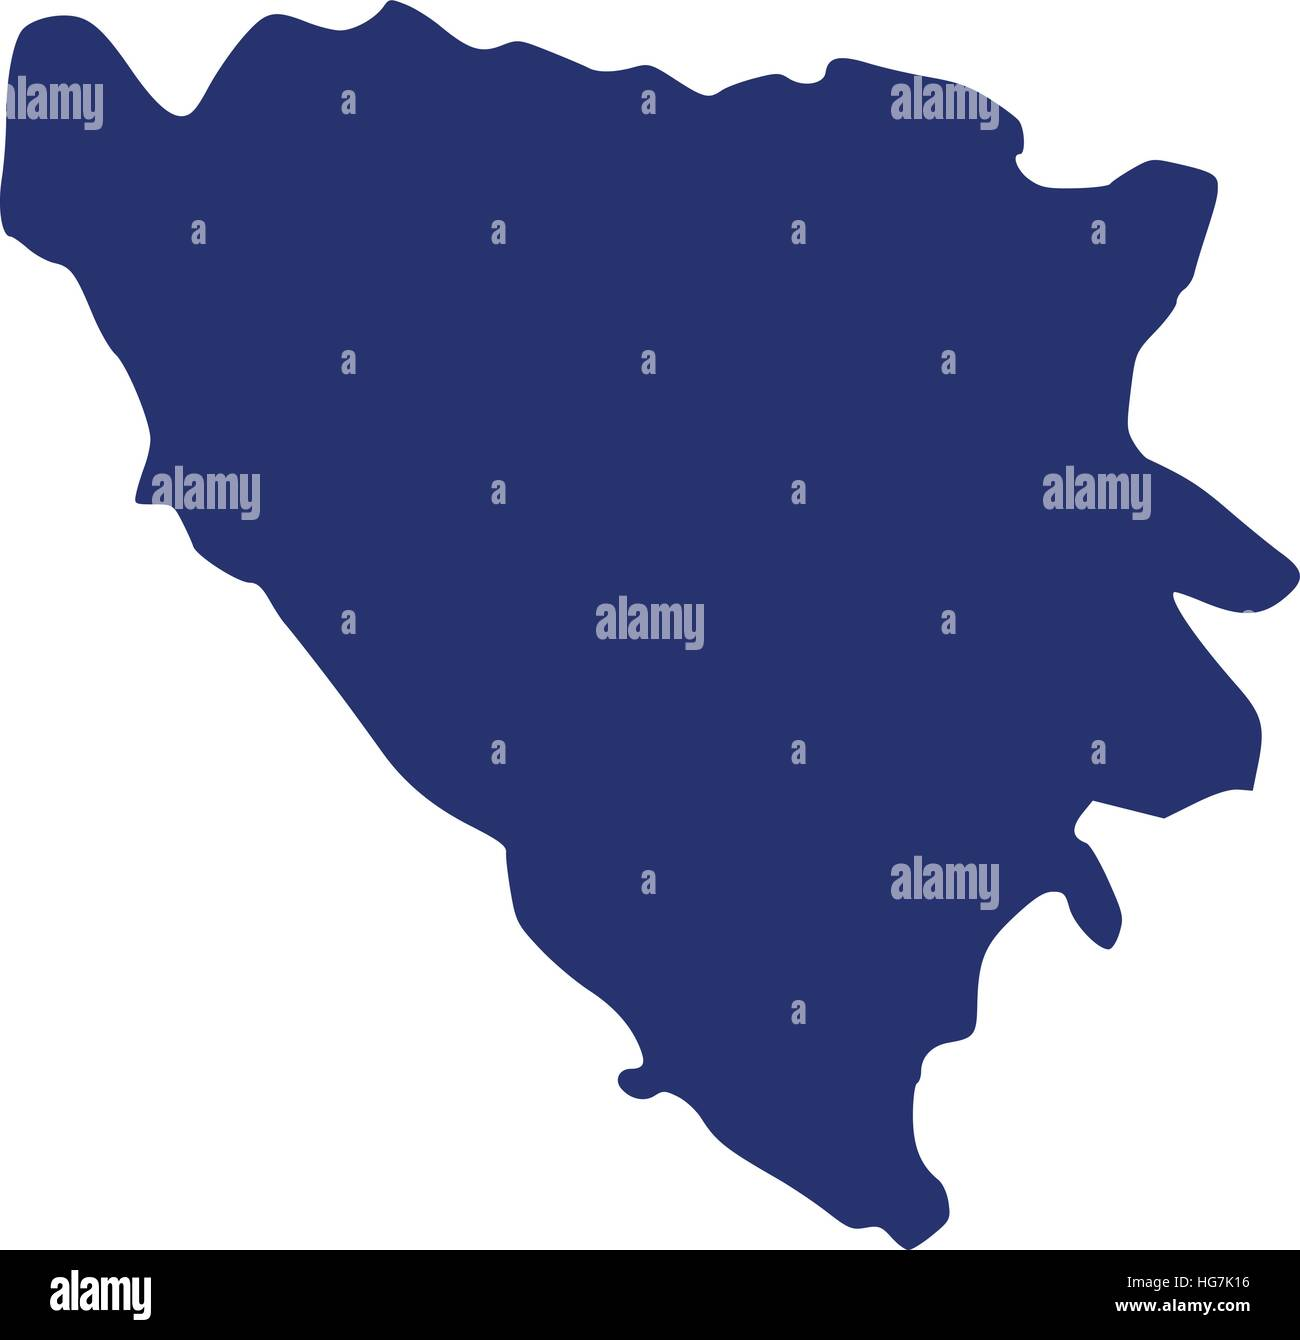 Bosnia and Herzegovina map - Stock Vector